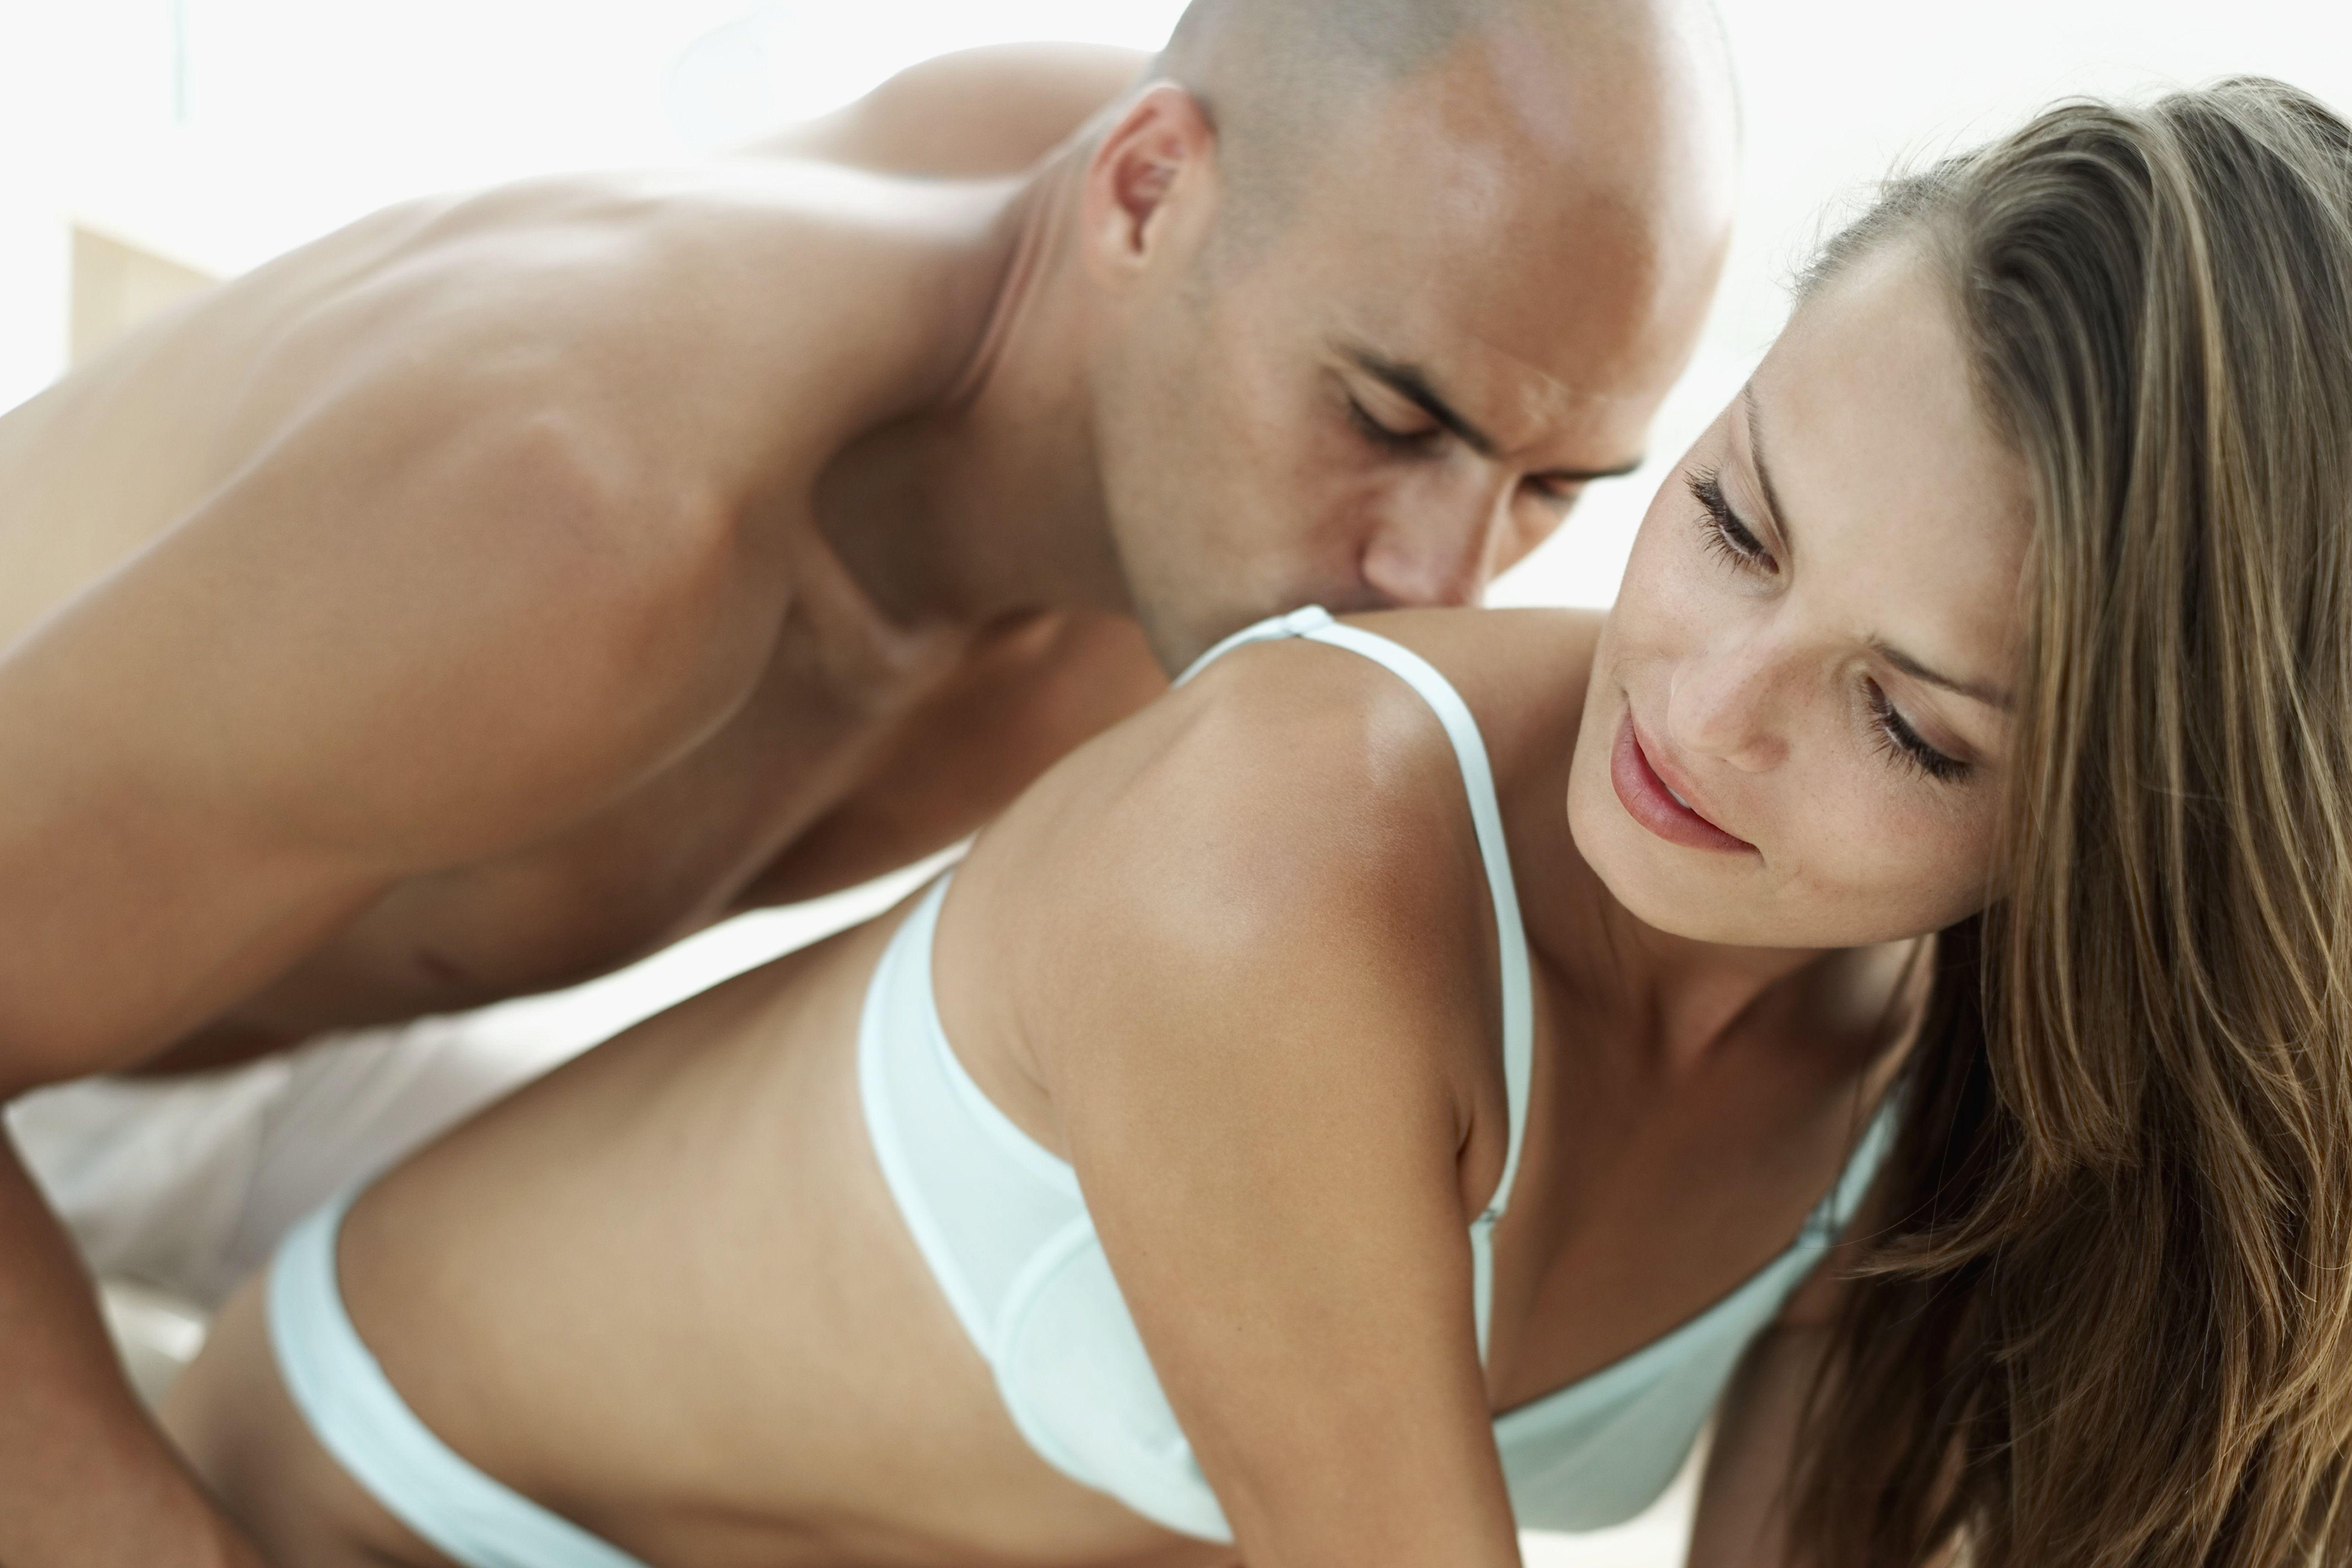 классический секс до оргазма - 2